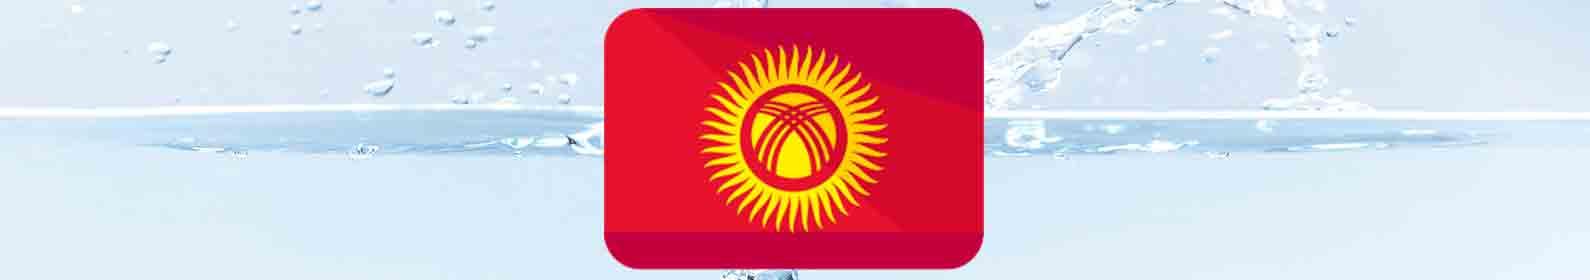 water-treatment-kyrgyzstan.jpg